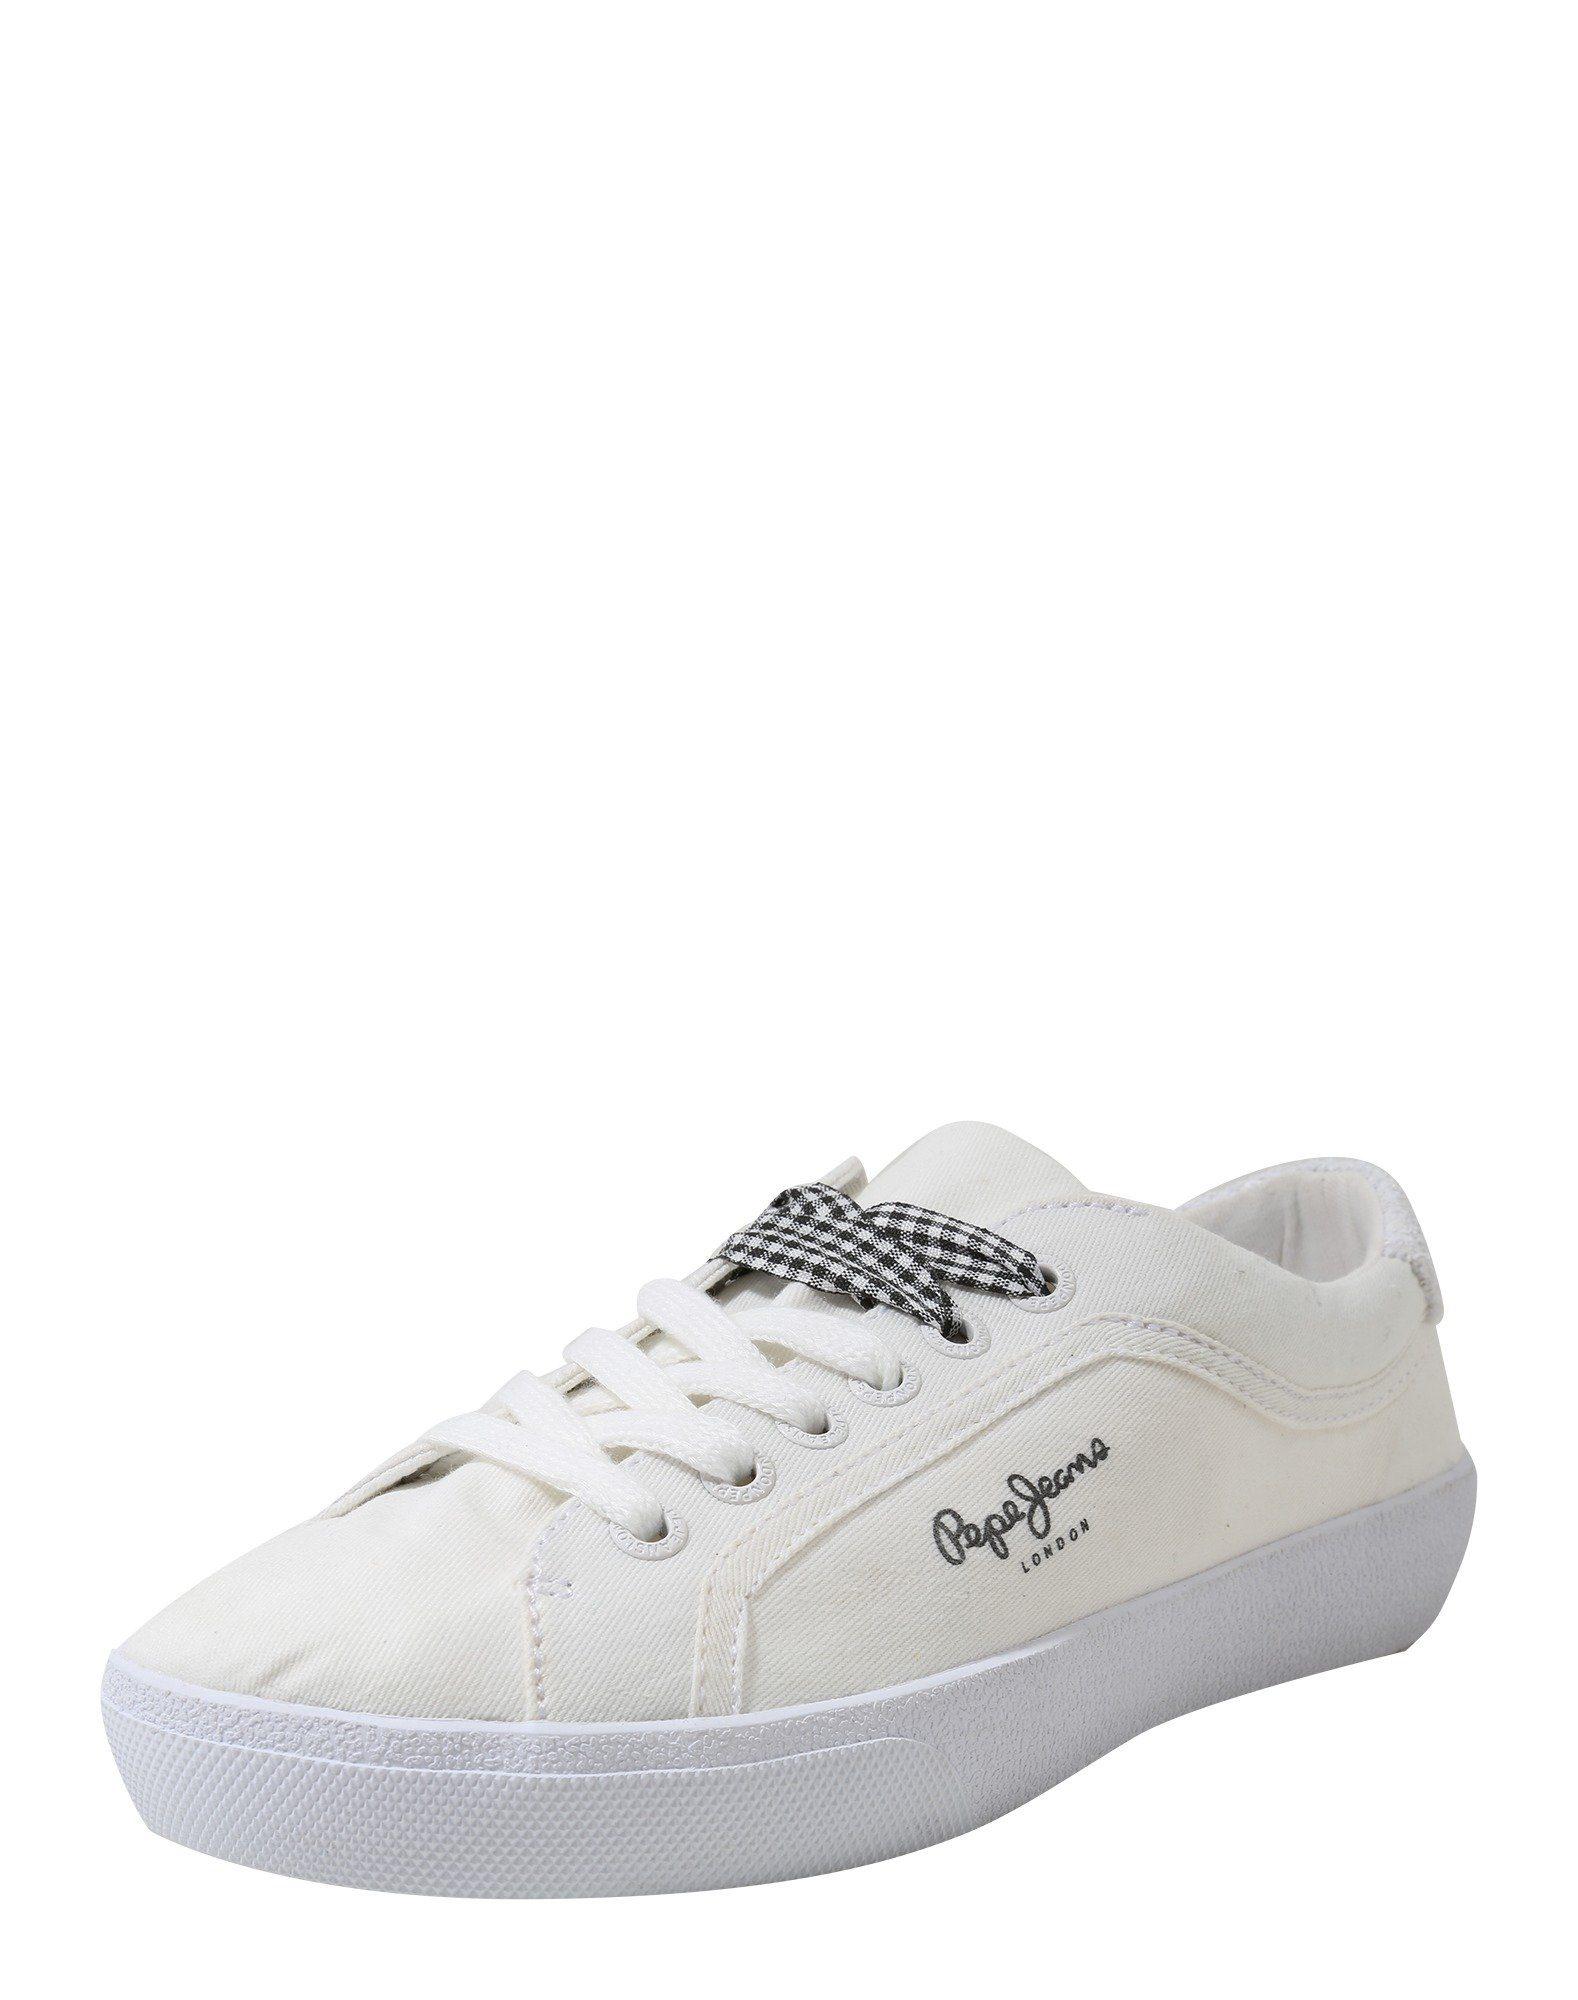 Pepe Jeans Rene Skate Sneaker online kaufen  weiß